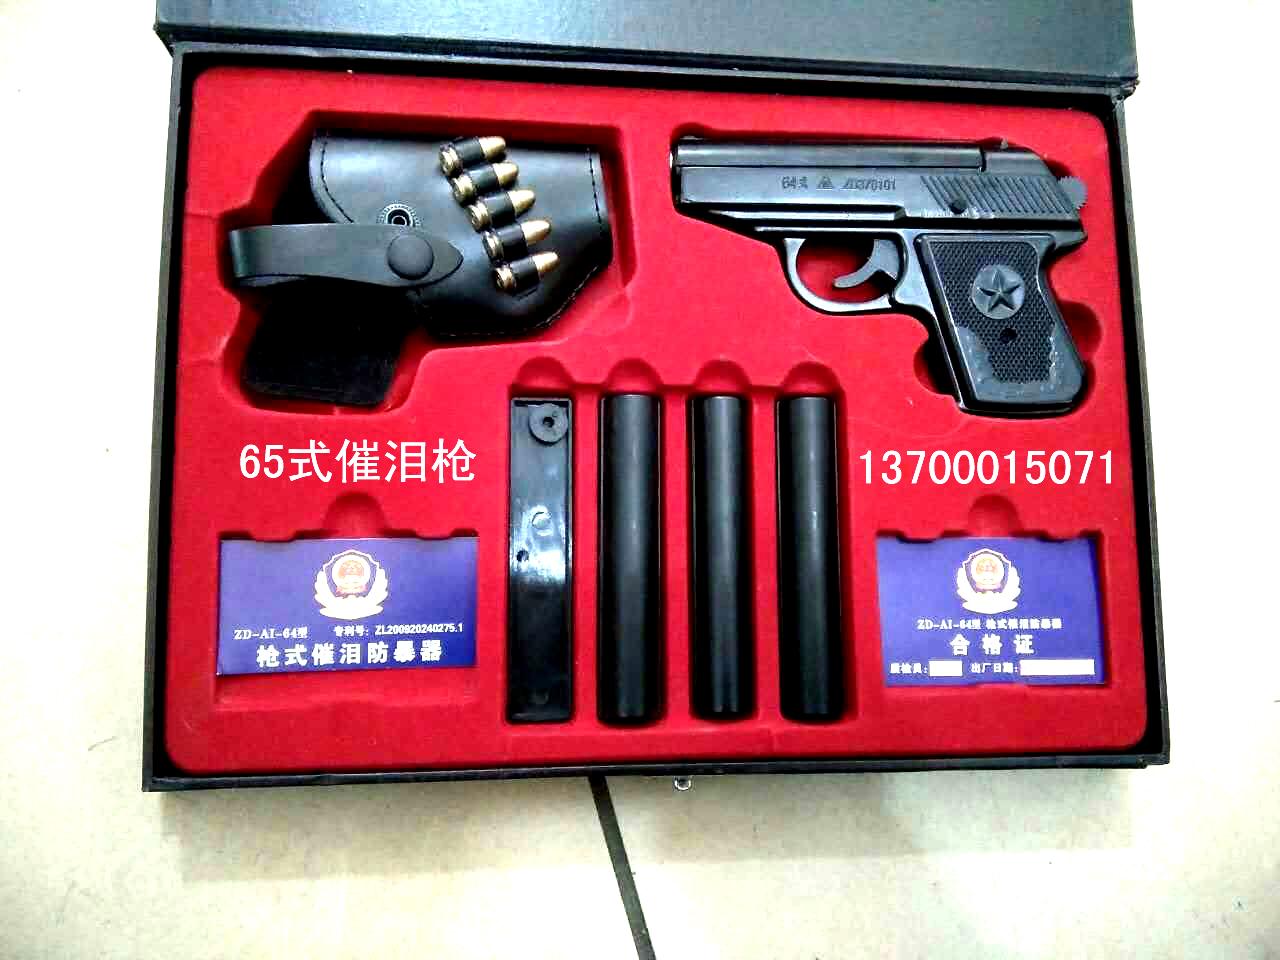 <font color='#FF0000'>警用装备警用产品警用器材警用设施</font>